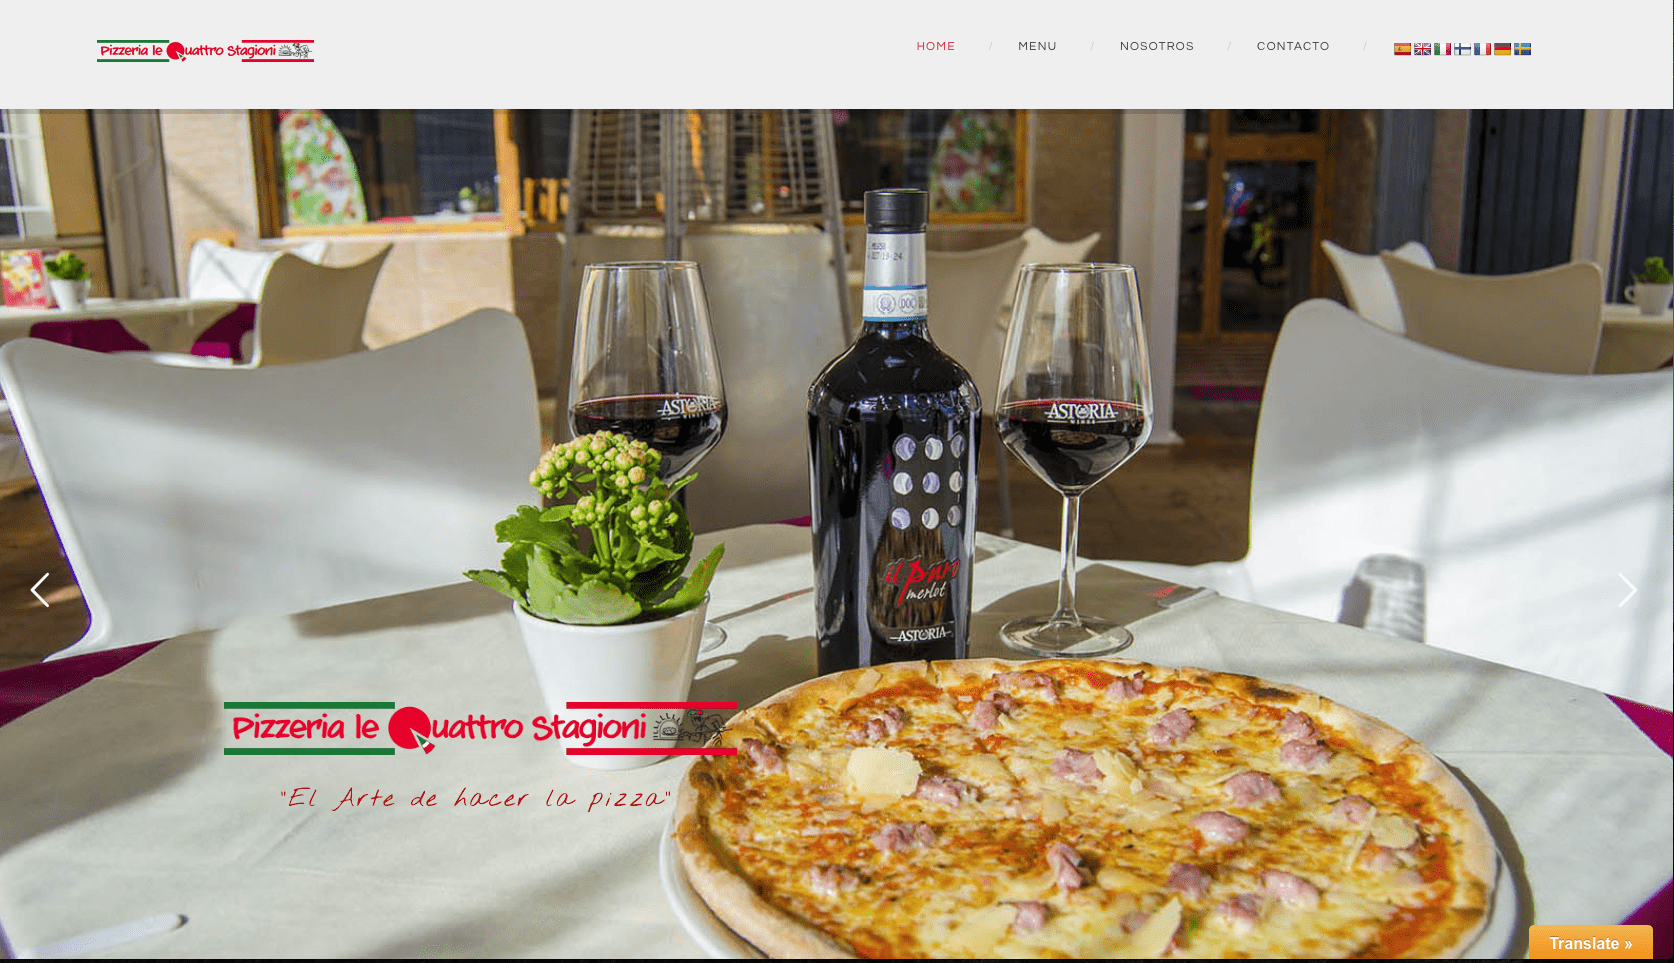 Pizzeria Le Quattro Stagioni